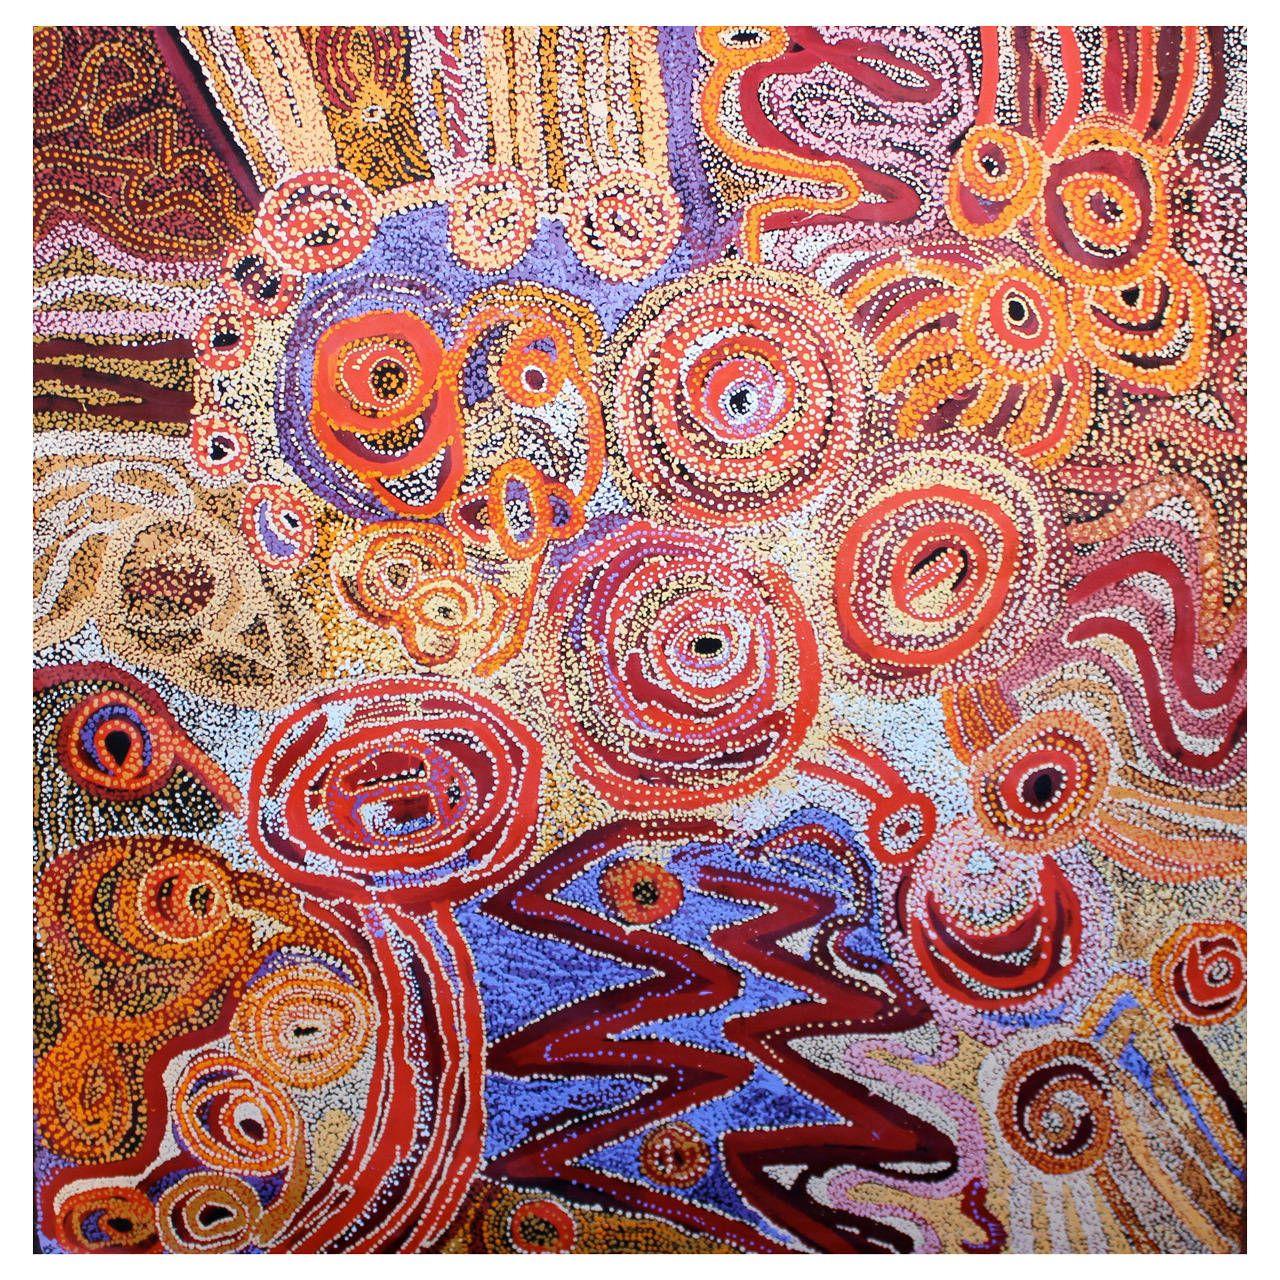 21st century australian aboriginal acrylic painting from